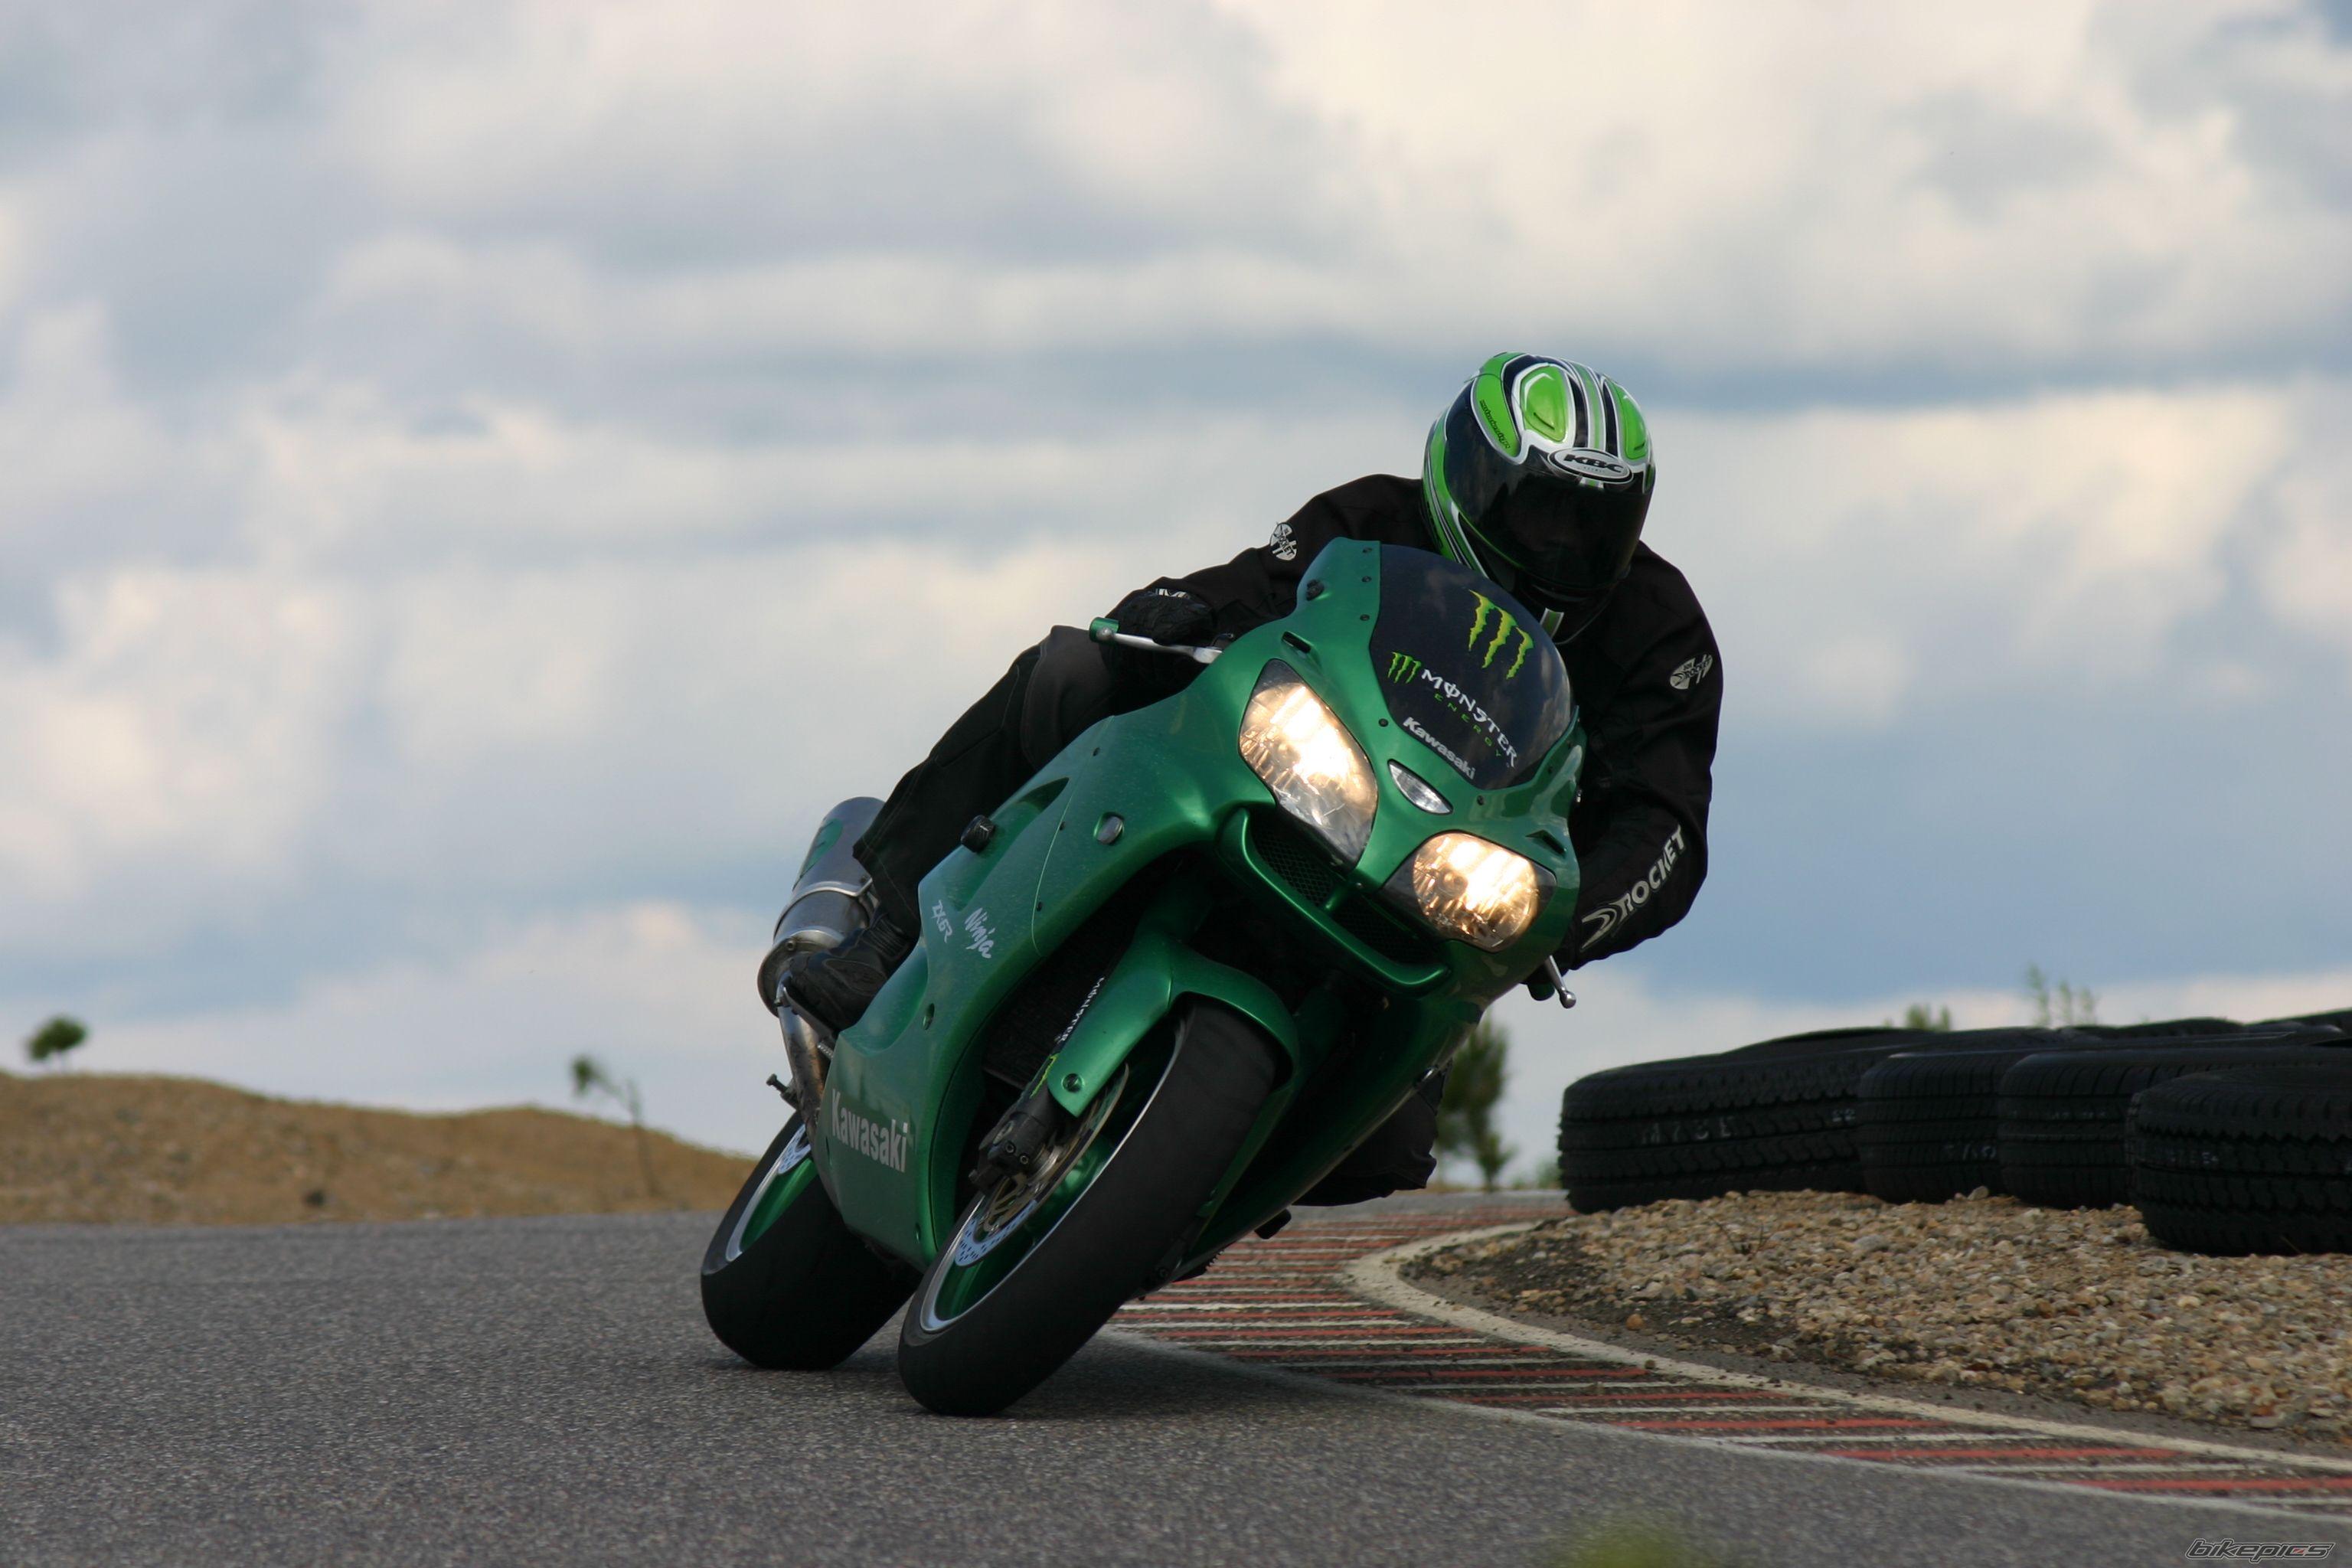 Тест-драйв мотоцикла Kawasaki ZX-6R